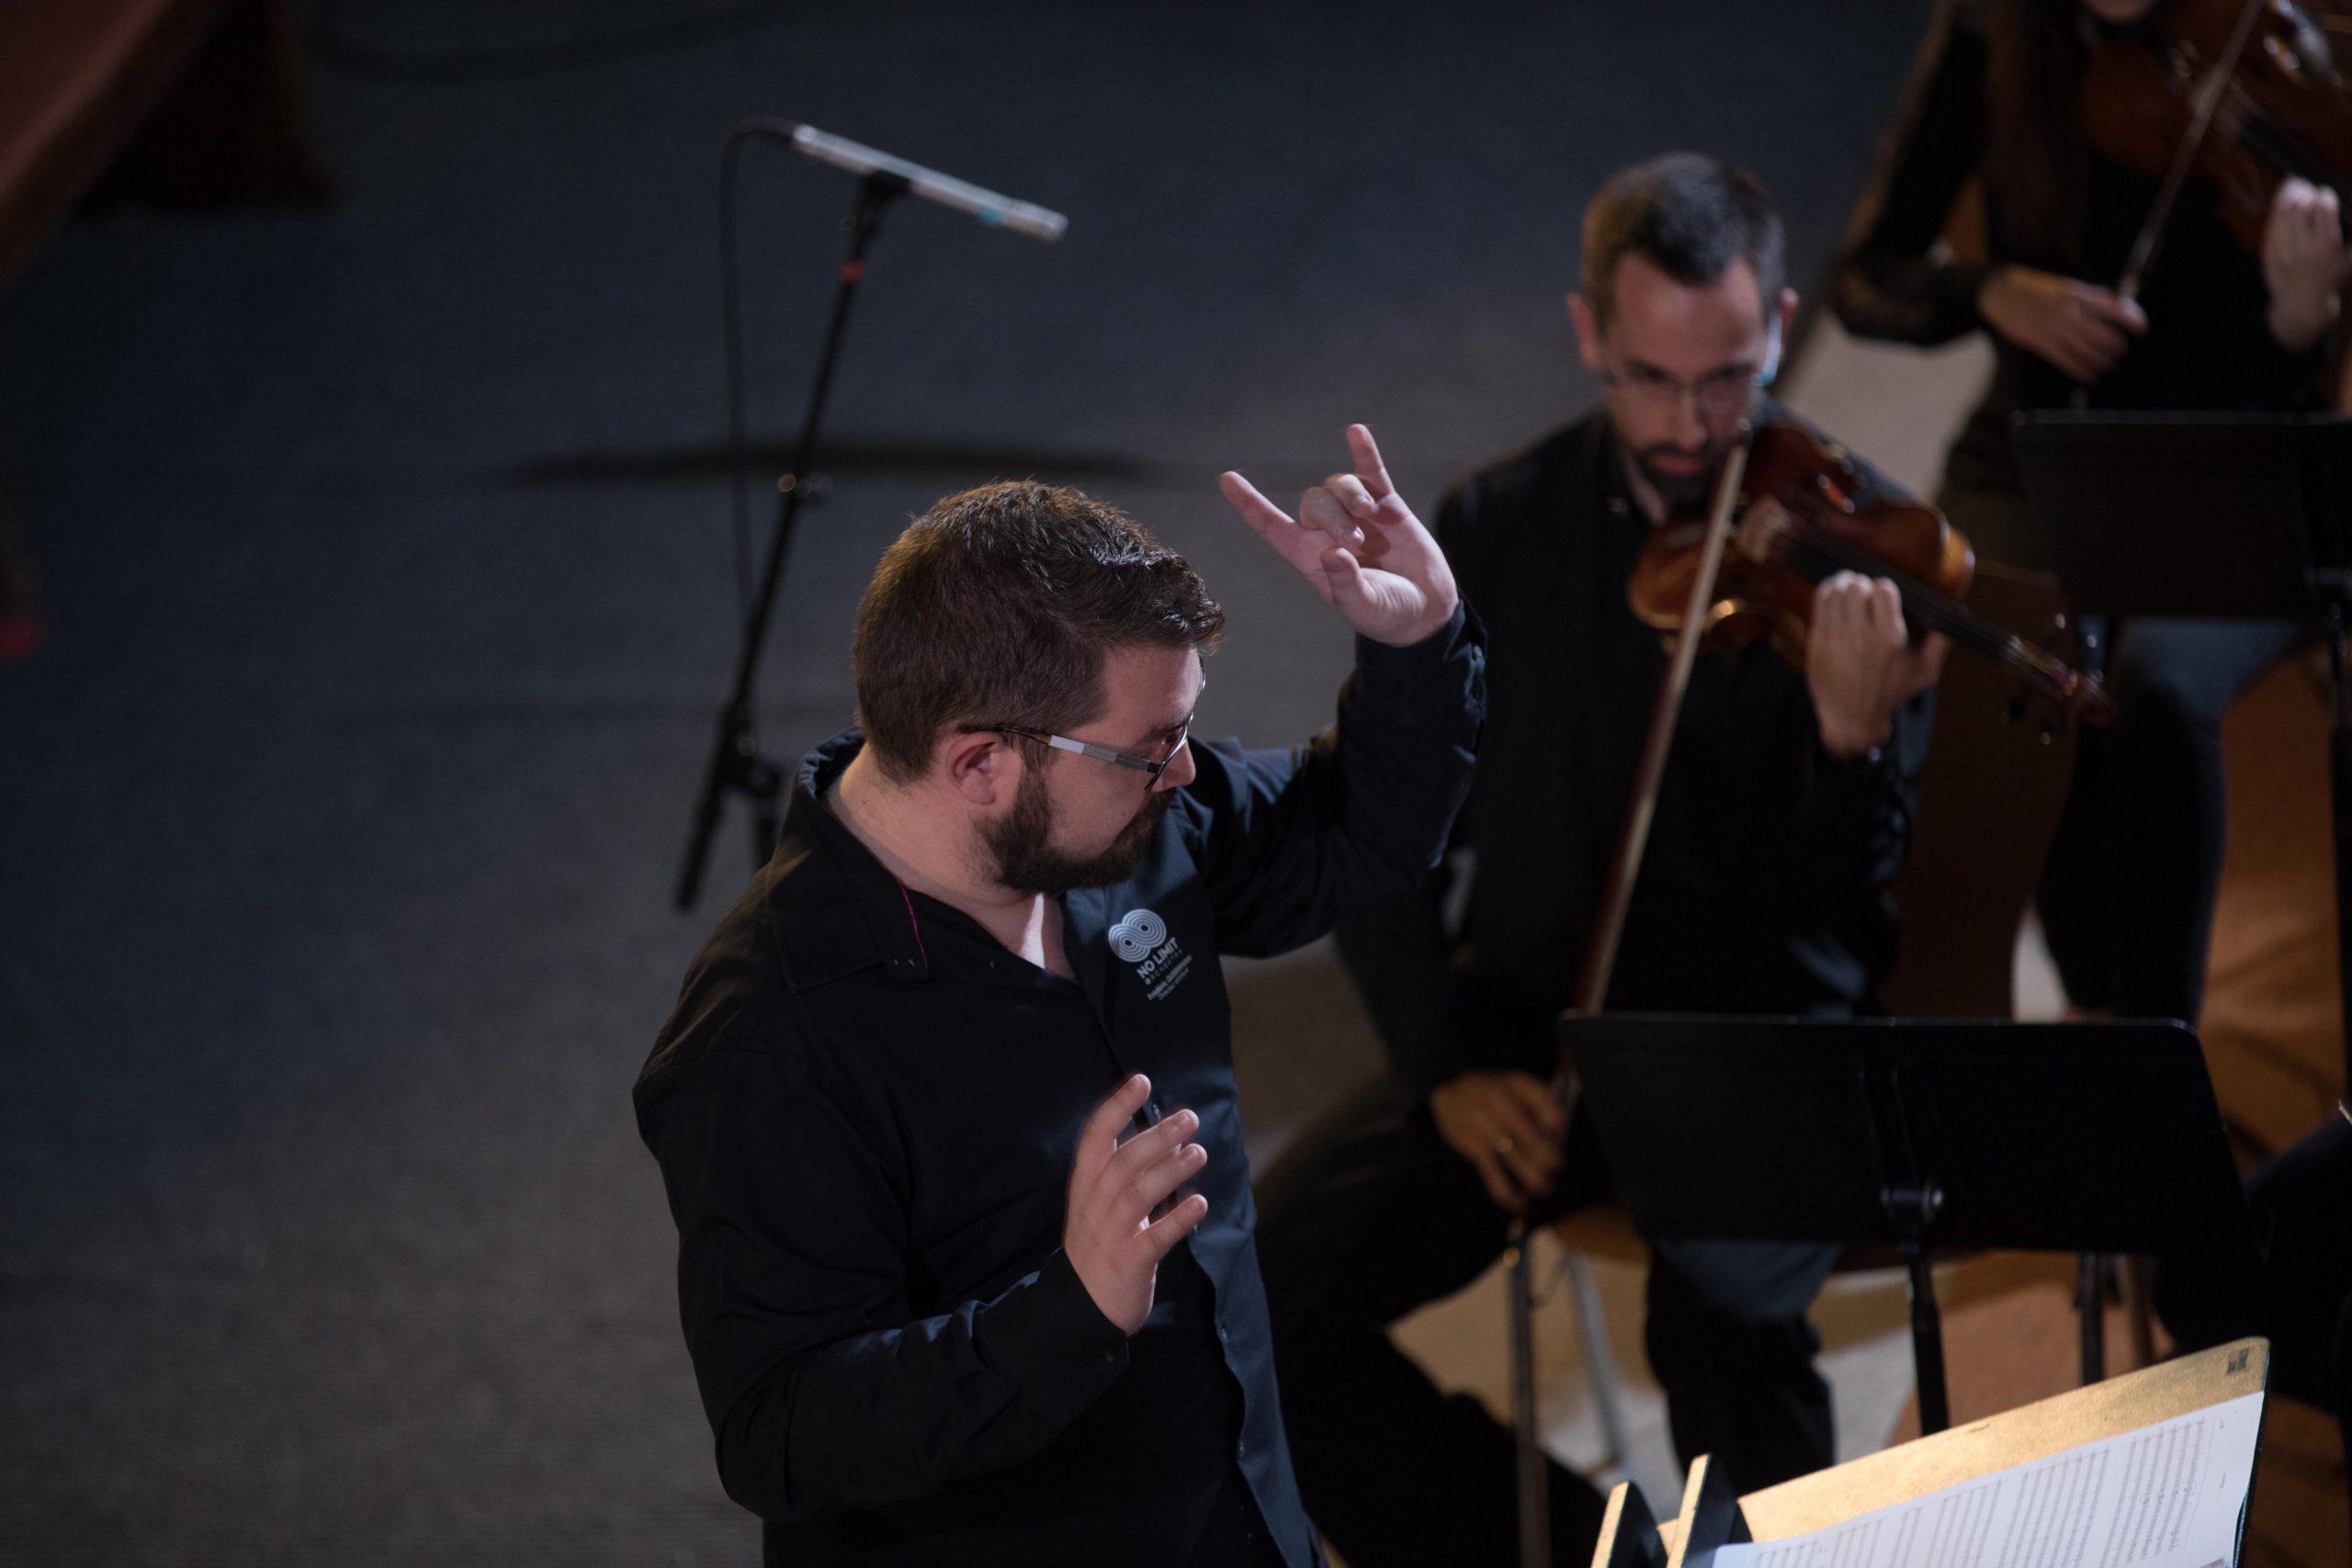 fluxus-projet-no-limit-orchestra-chef